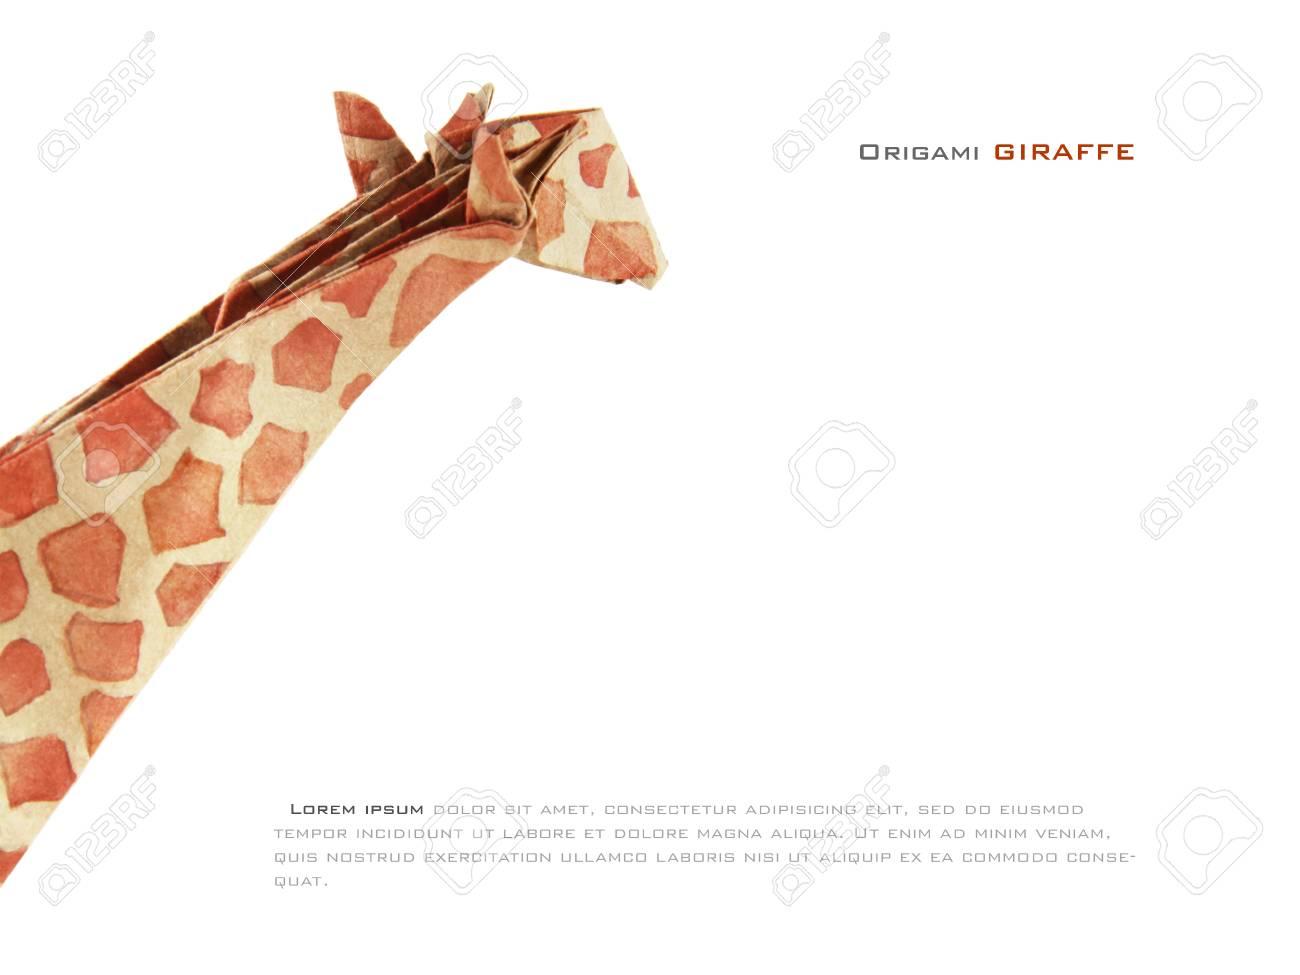 Origami paper giraffe on a white background Stock Photo - 17728437